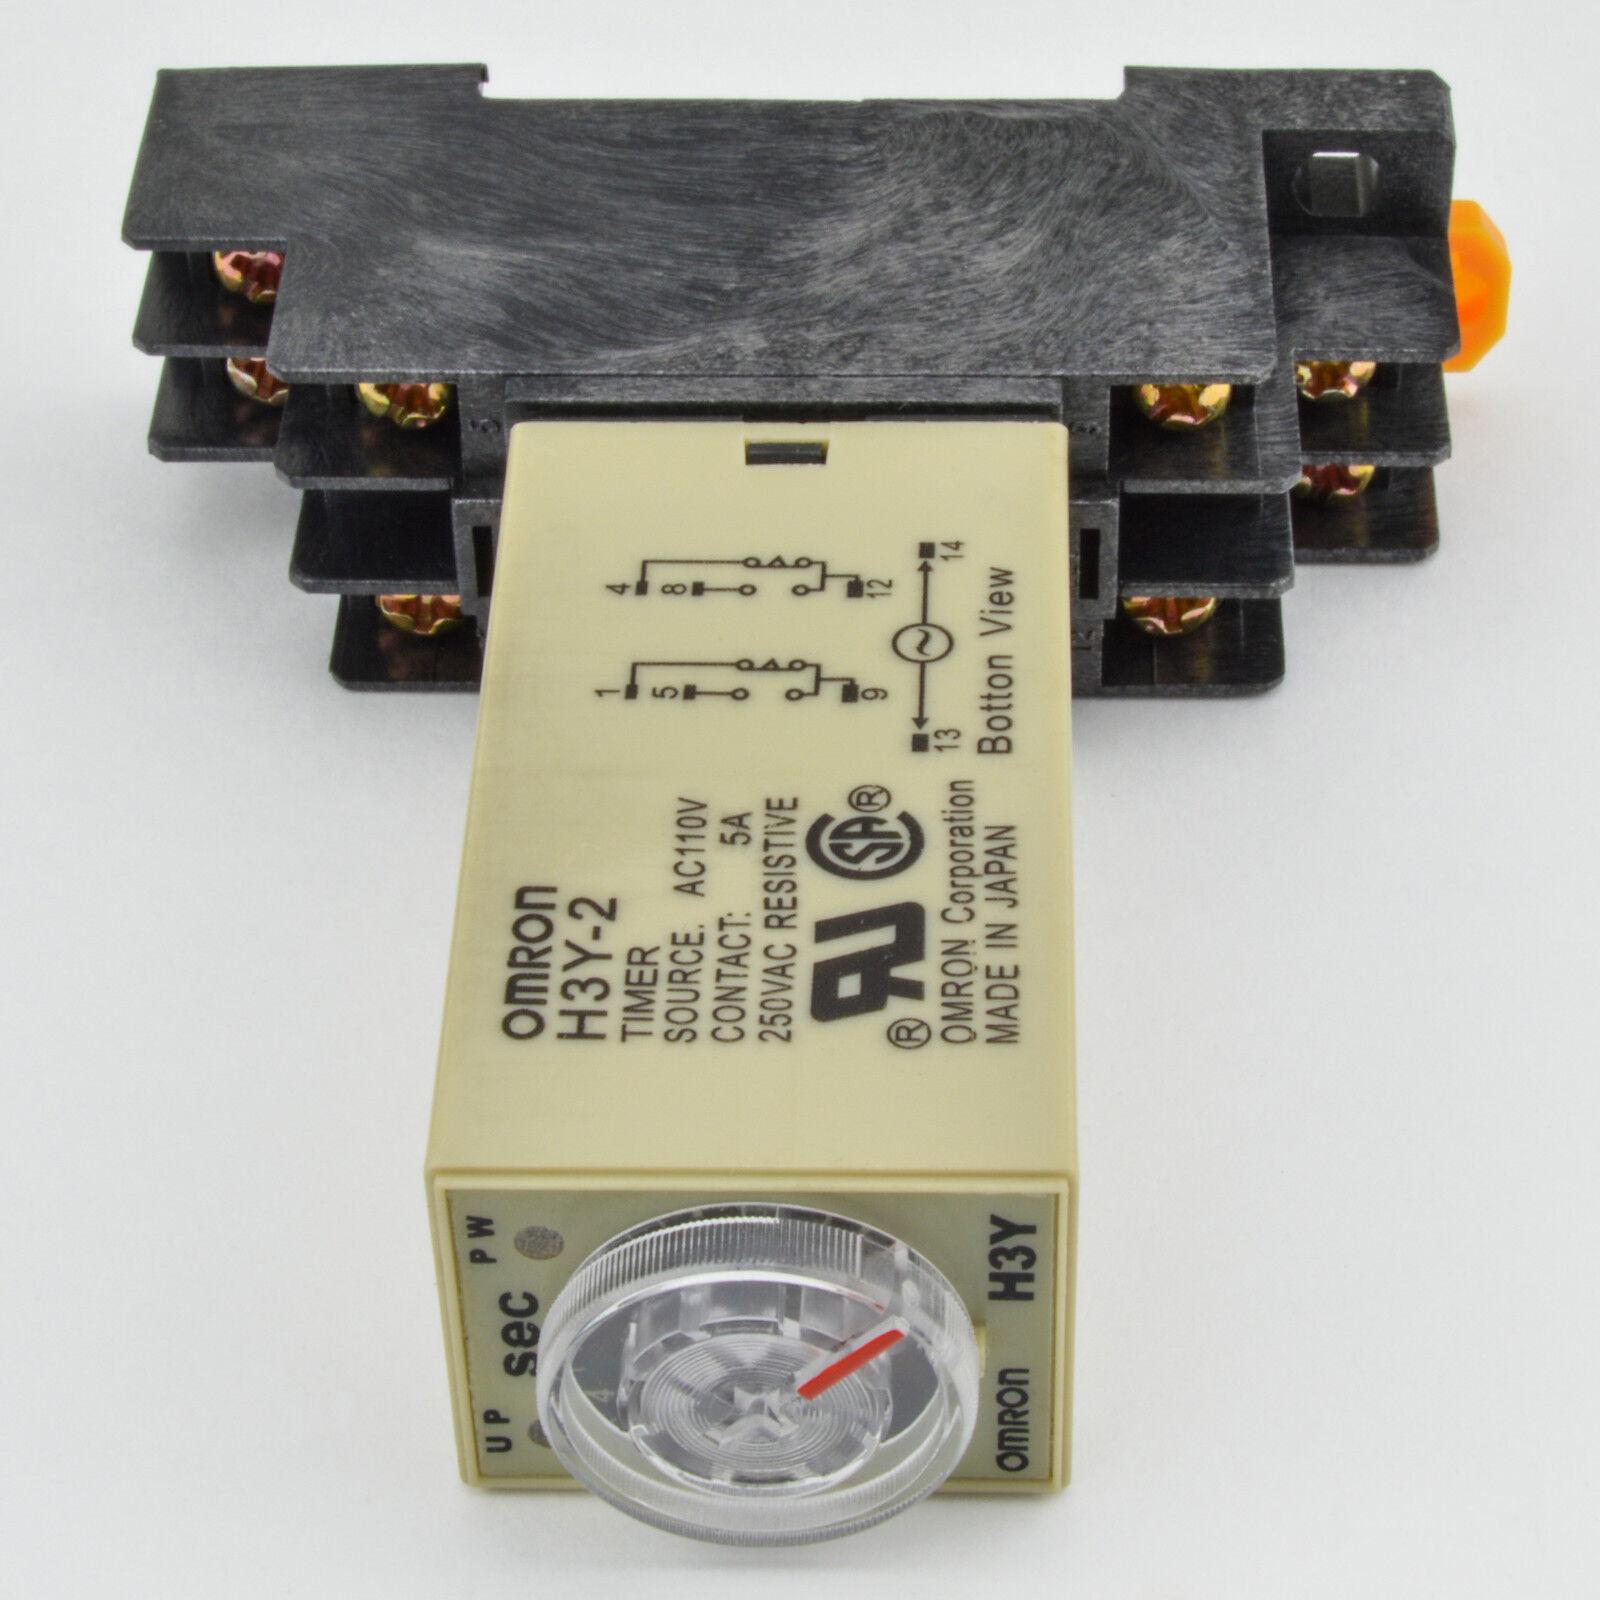 s l1600 120vac relay ebay  at eliteediting.co